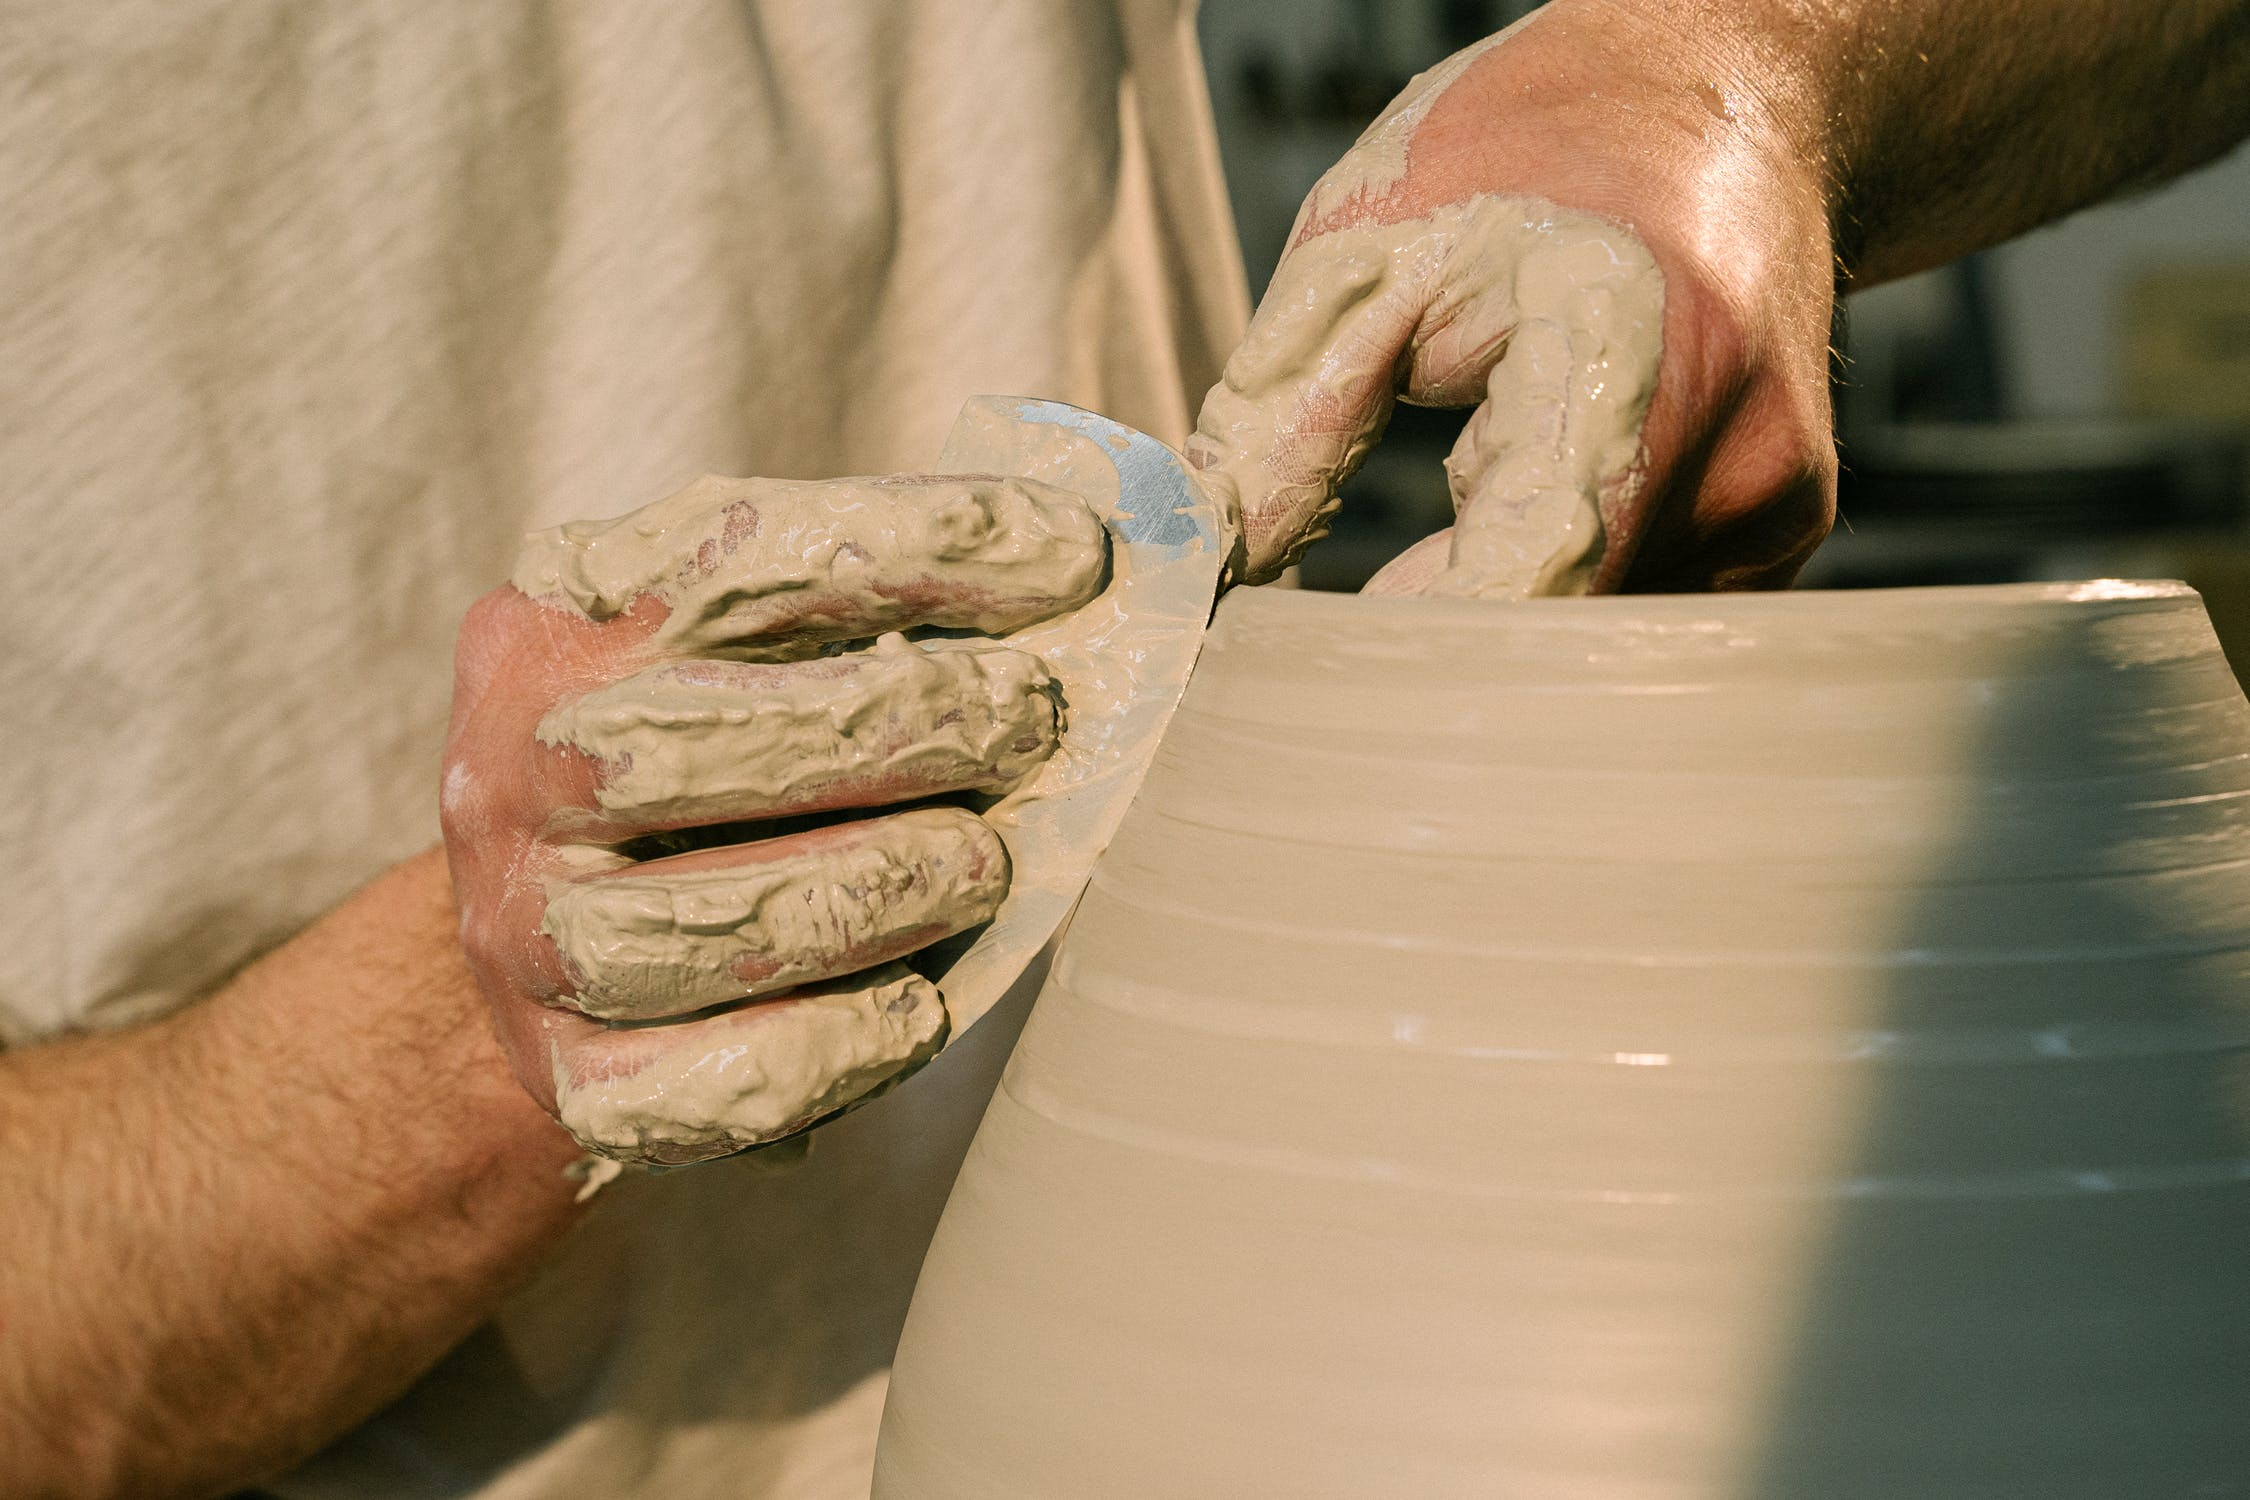 palloncini in ceramica pugliese – Laterradipuglia.it